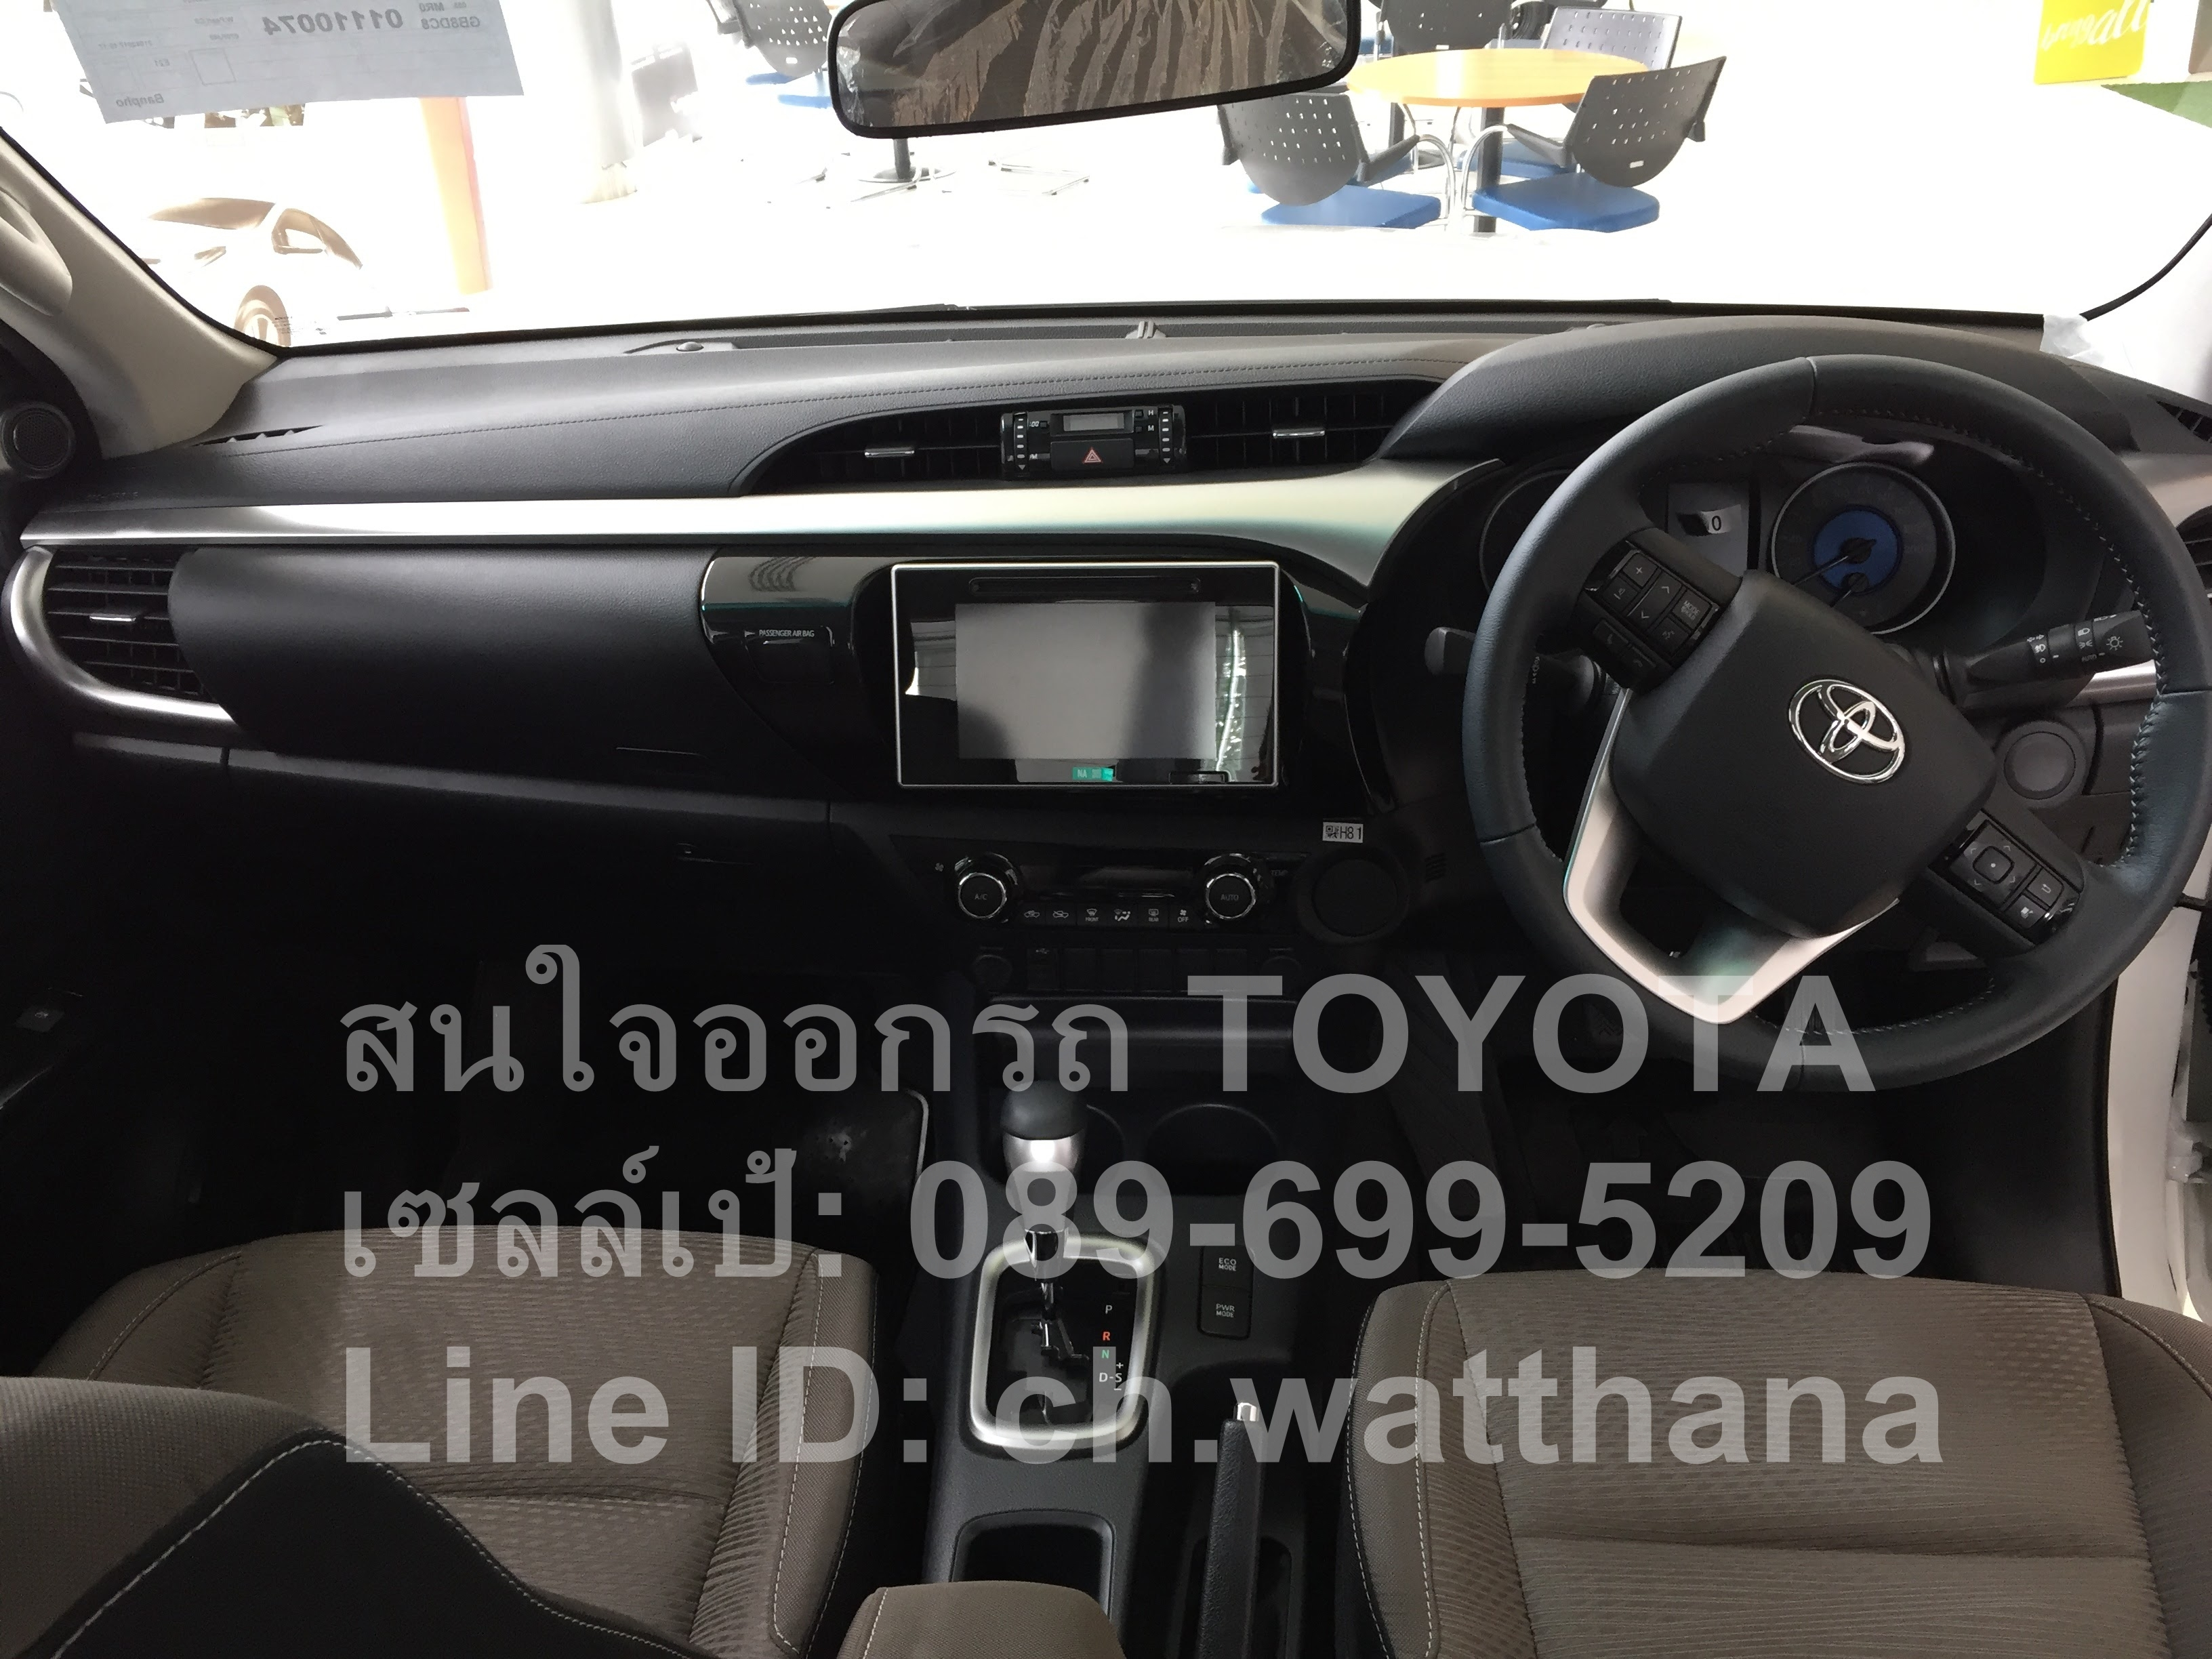 Revo 2.4G AT แคบ-ยกสูง Smart Cab Pre-runner-โปรโมชั่น-ภายนอก-ภายใน (2)